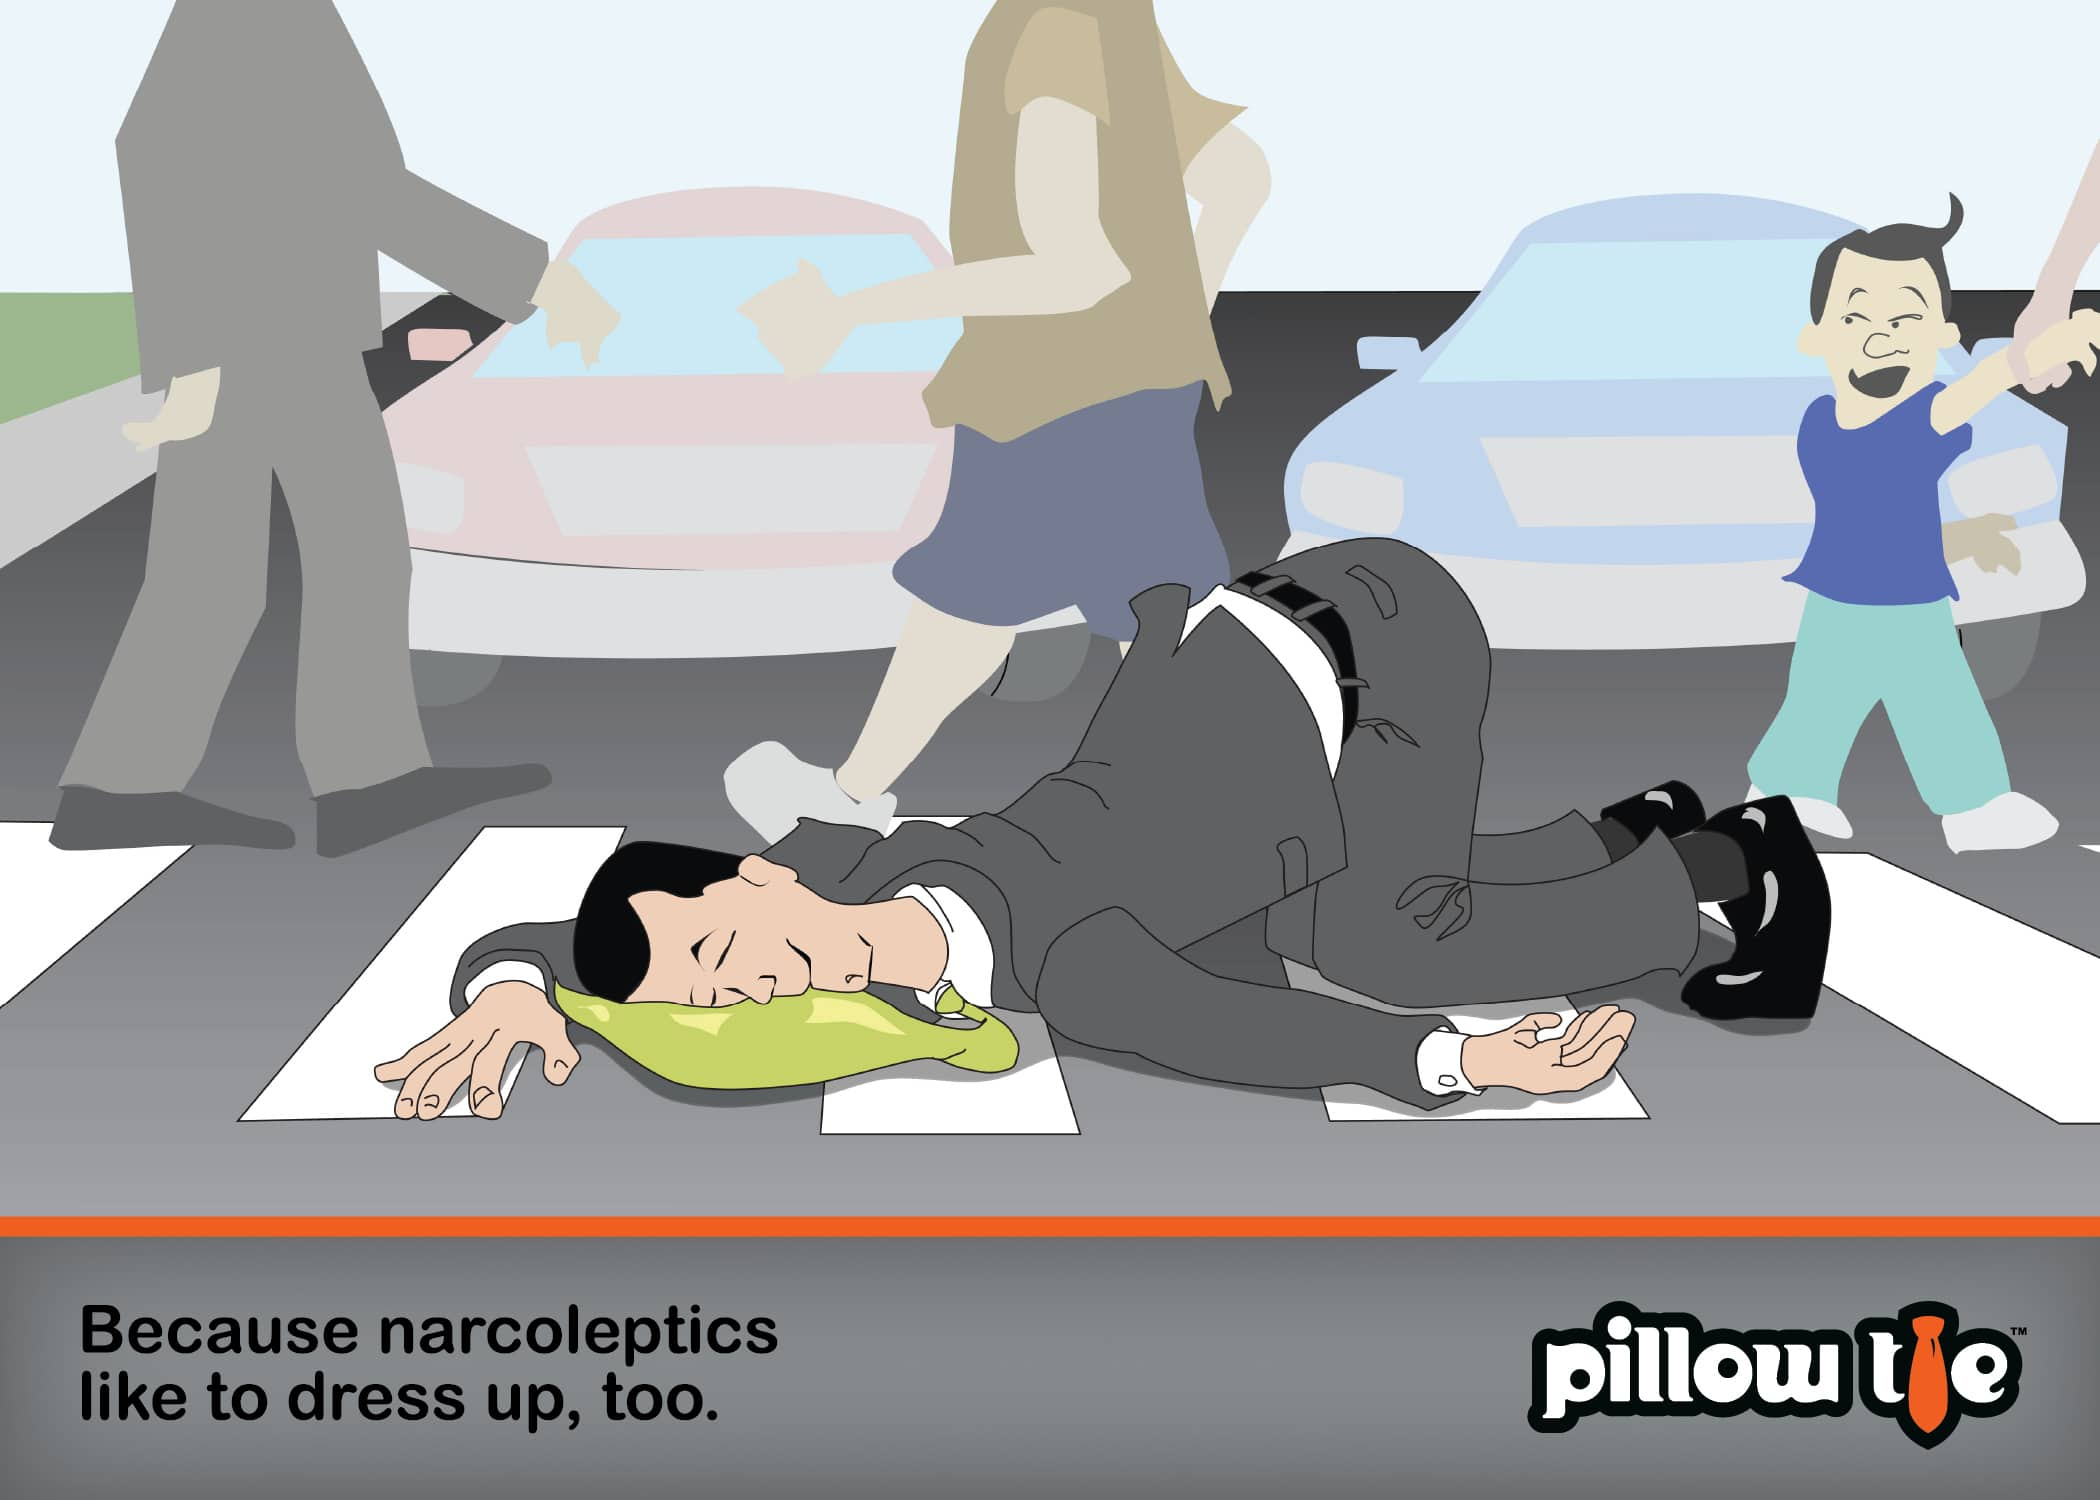 The Inflatable Pillow Tie: Sneak Sleep On The Job